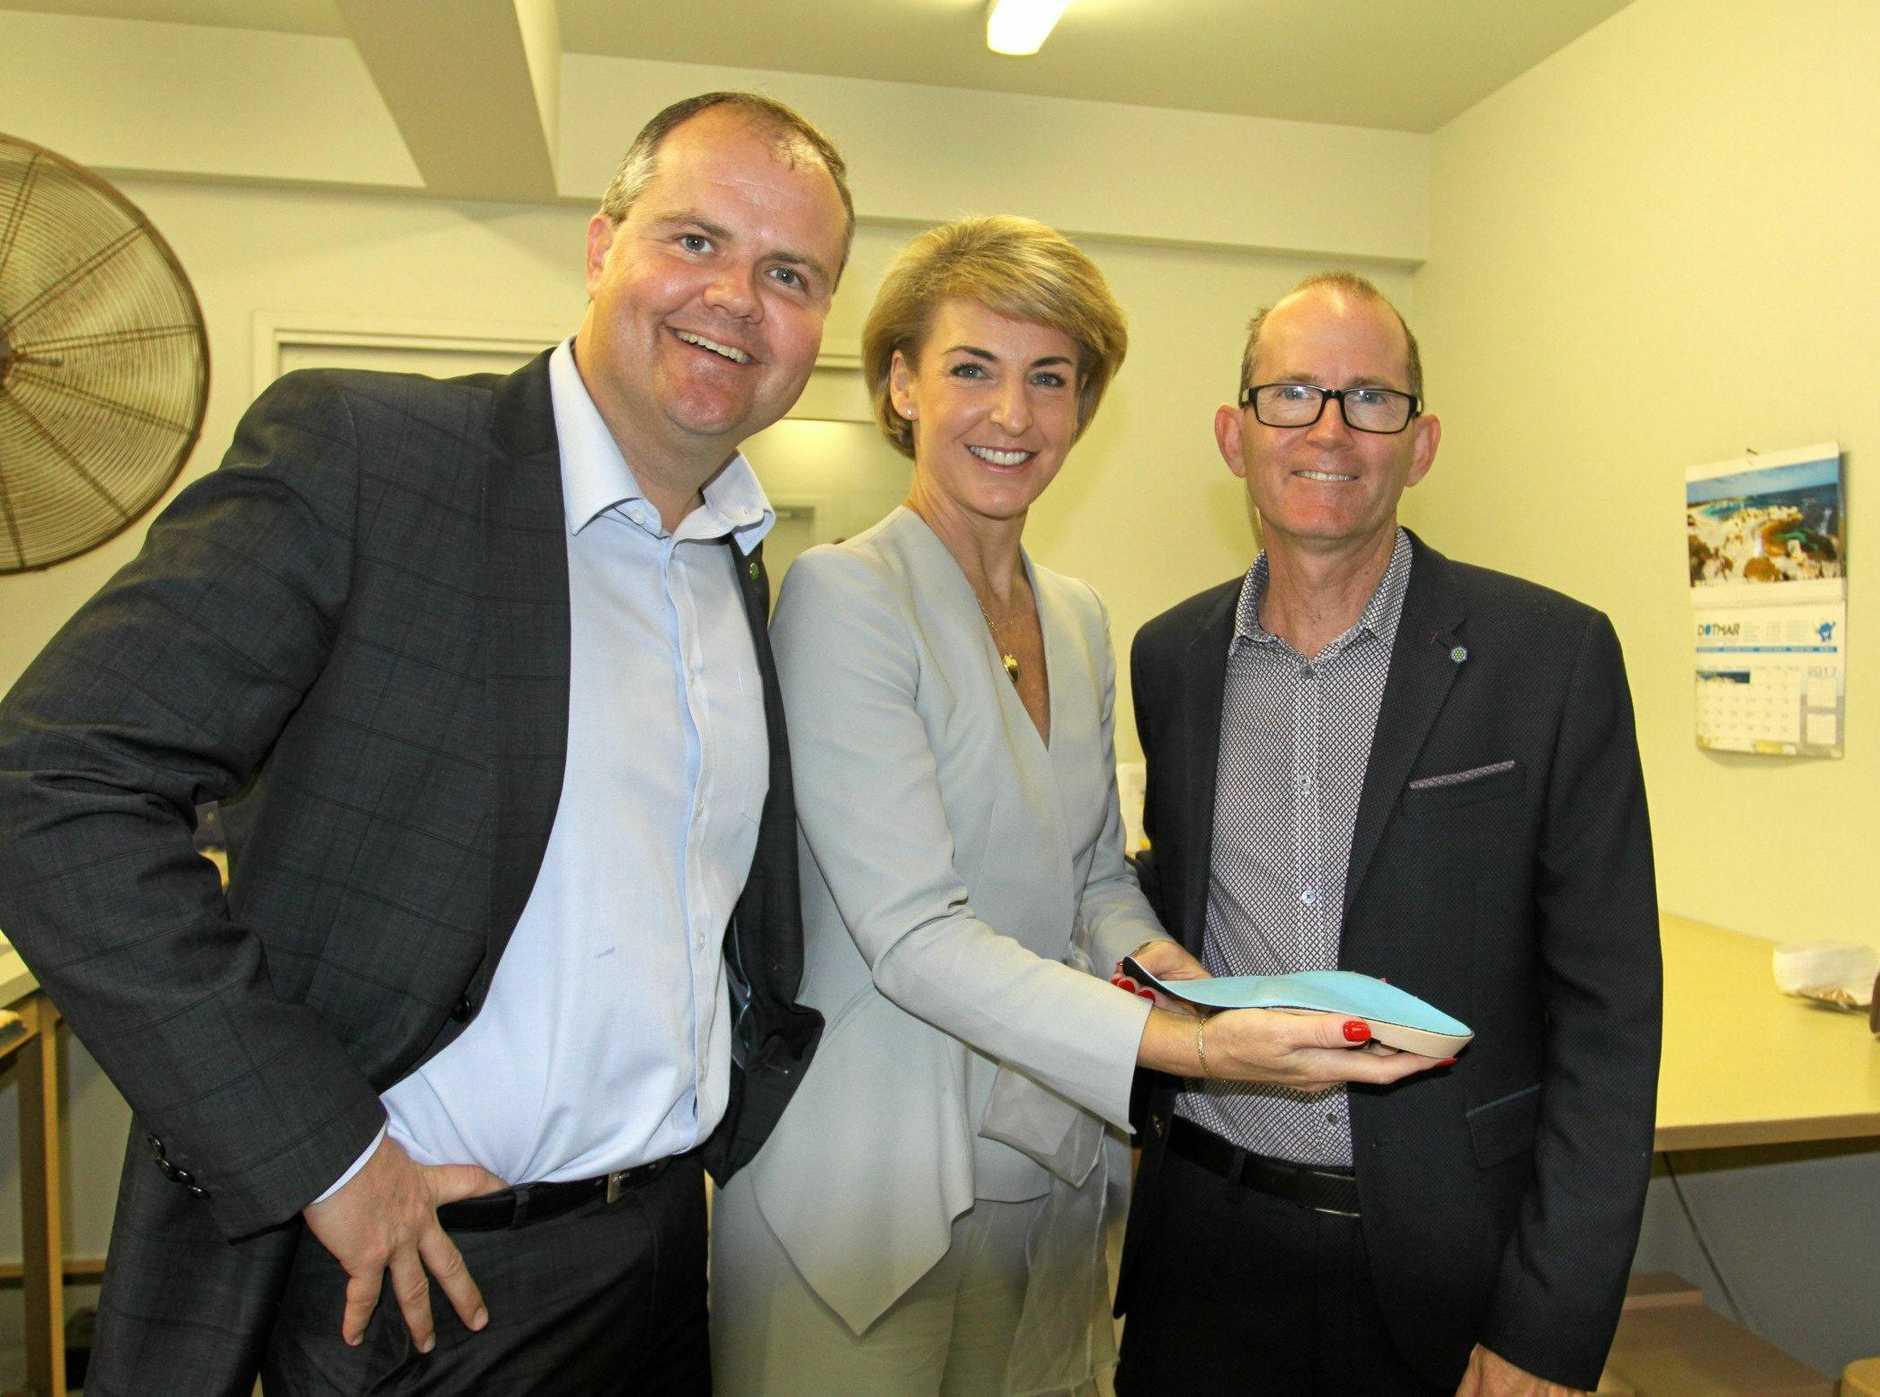 Member for Fairfax Ted O'Brien MP, Employment Minister Senator Michaelia Cash and Sunshine Coast podiatrist Dan Everson at the Marcoola factory Kinetics Orthotics.